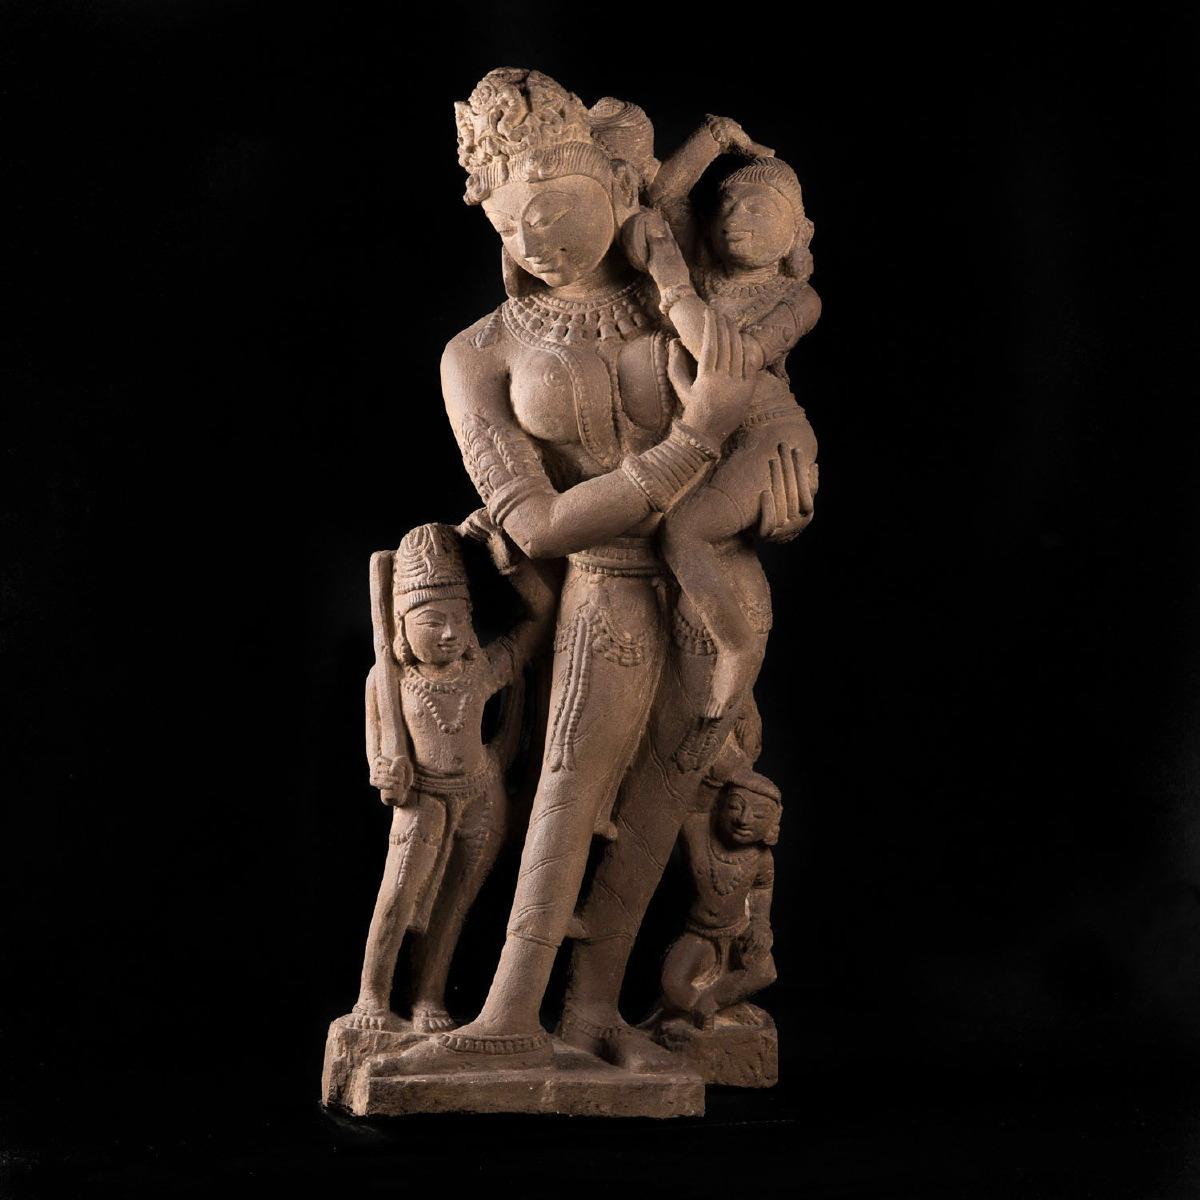 Photo of parvati-and-his-childre-medieval-india-gorgeous-elegance-musuem-quality-galerie-golocnda